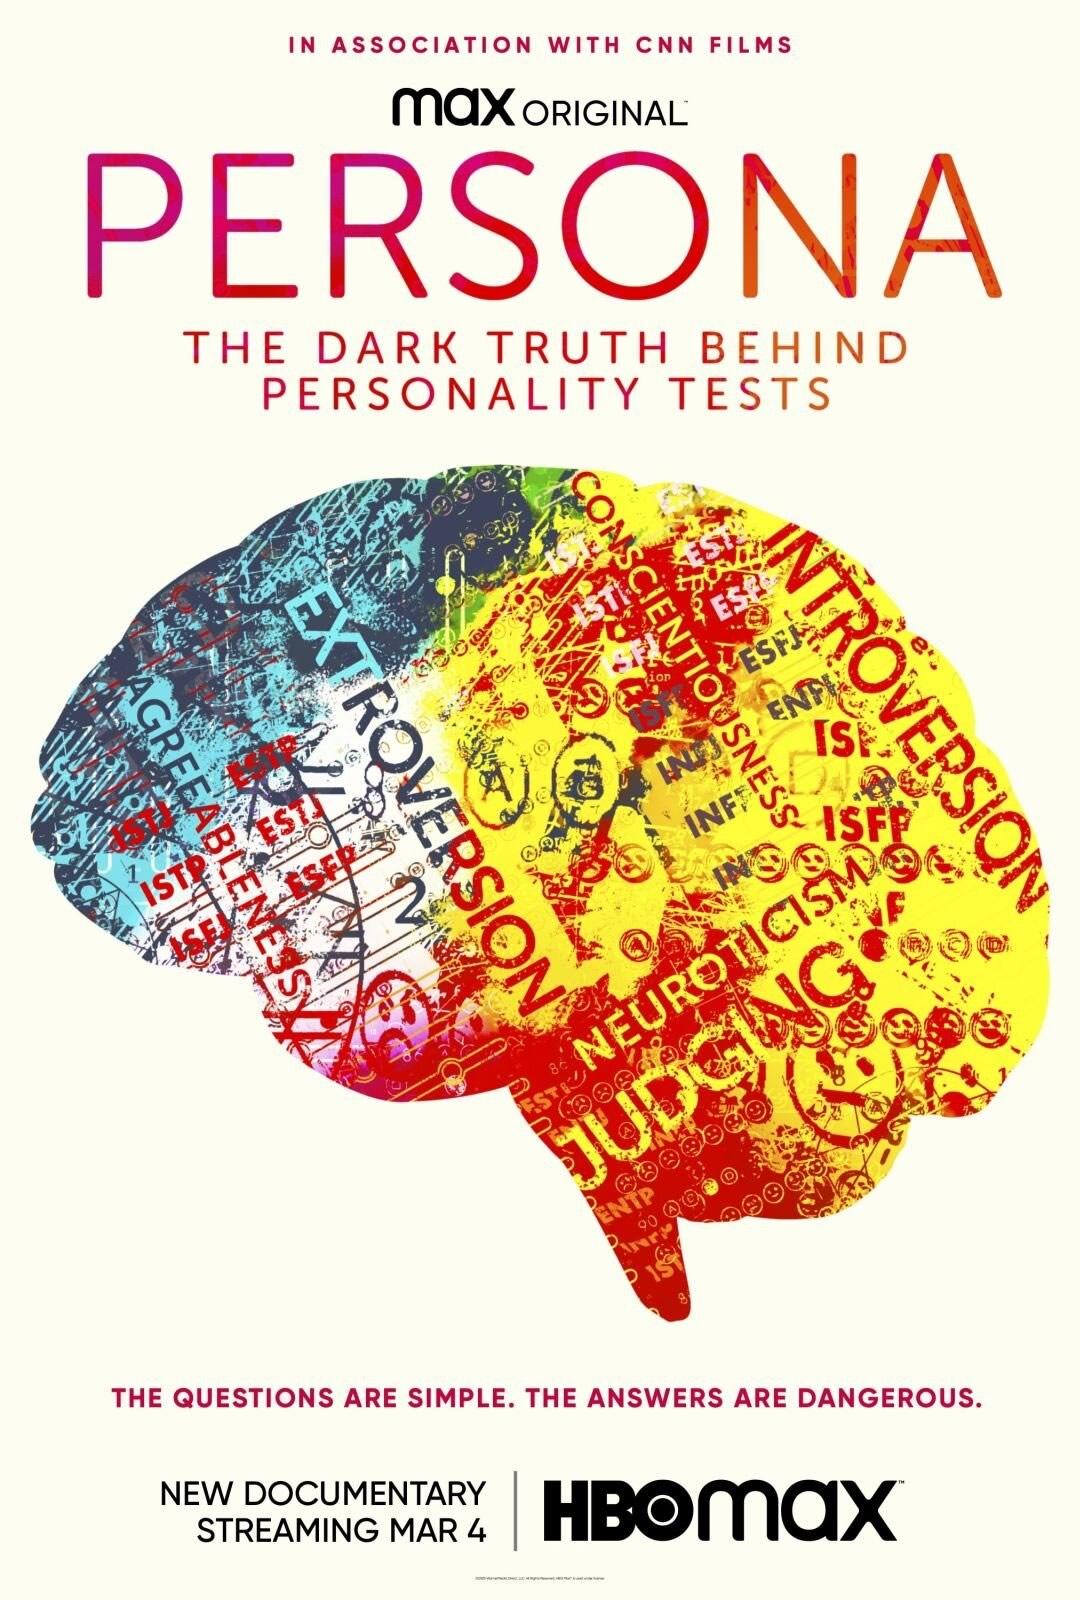 PERSONA | Documentário na HBO MAX sobre a verdade sombria por trás dos testes de personalidade